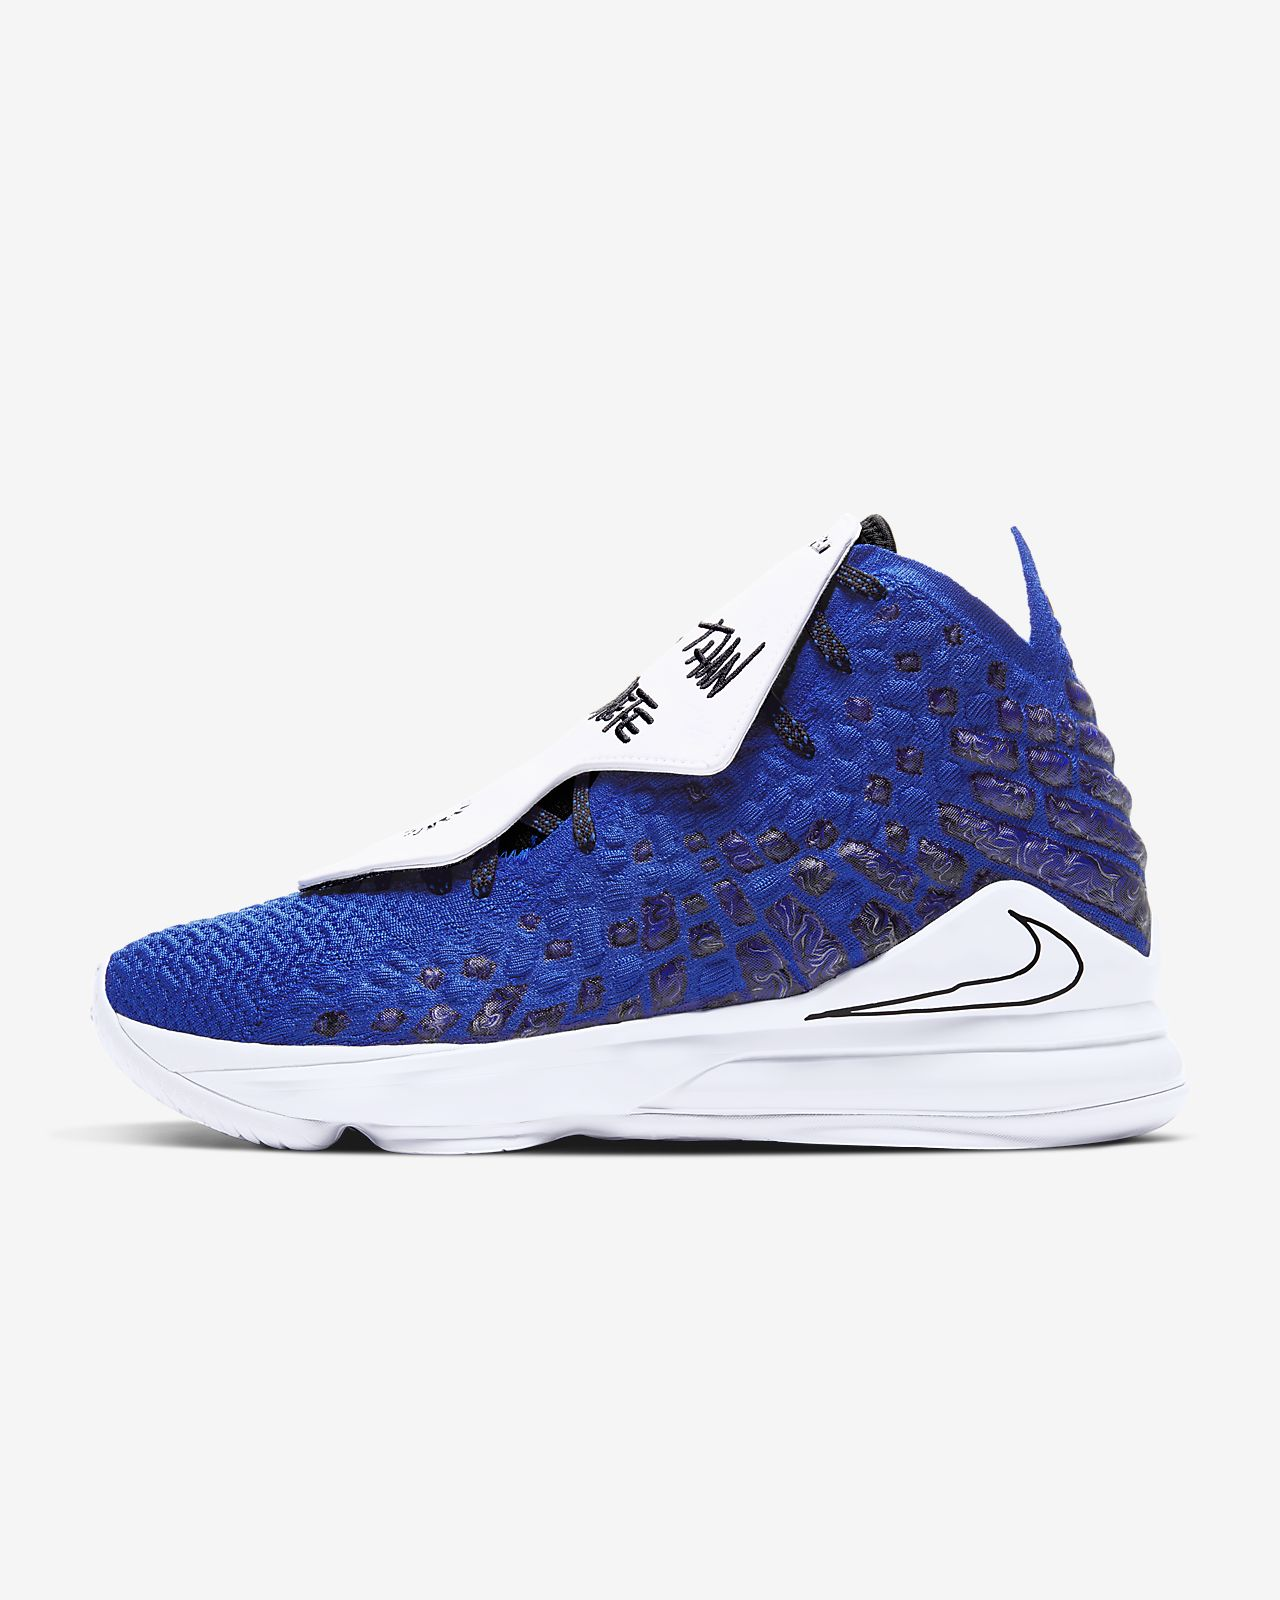 Nike Air Force 1 X Uninterrupted X Lebron James